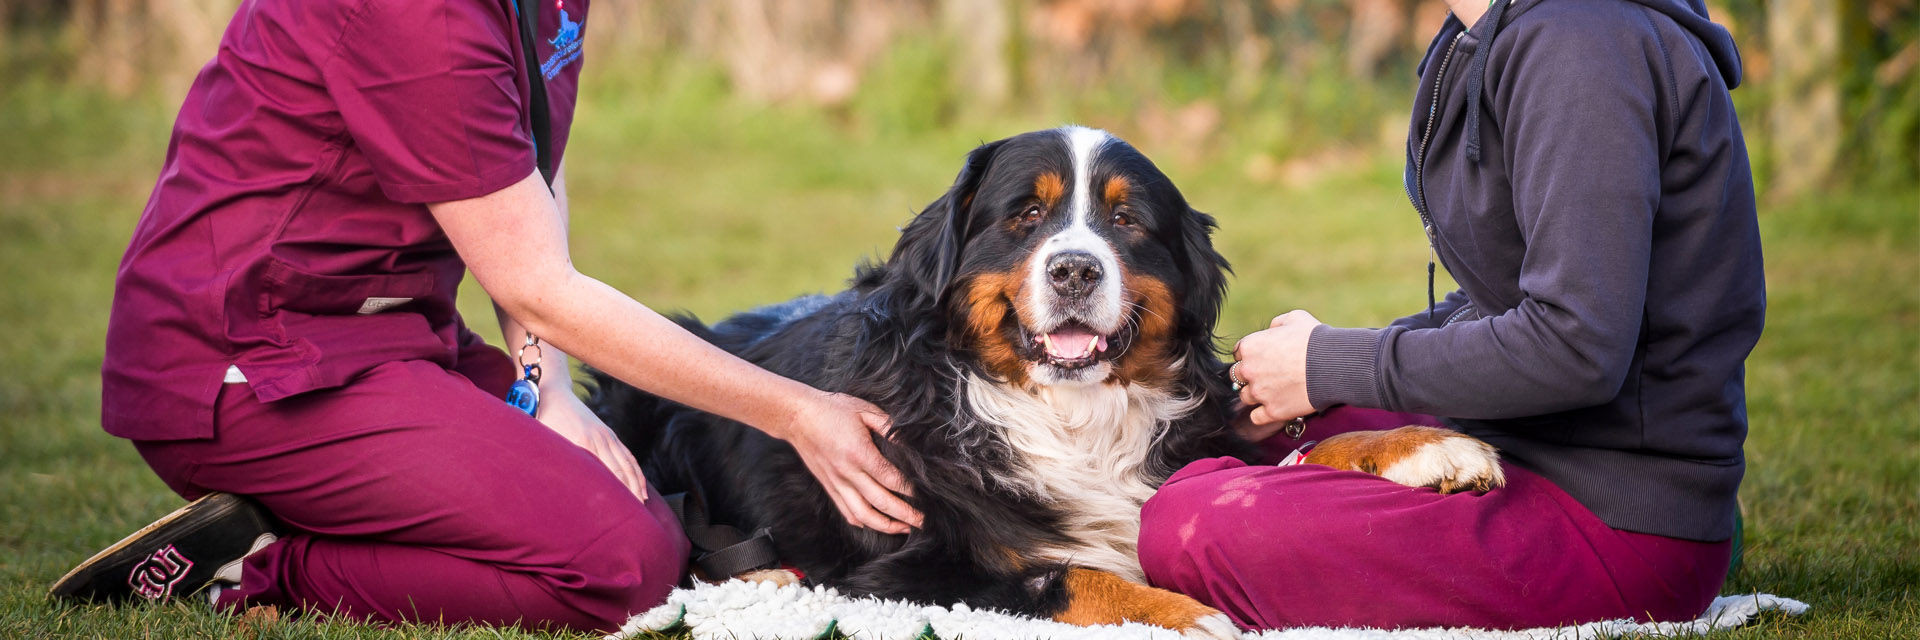 Veterinary auxiliary jobs Fitzpatrick Referrals Orthopaedics and Neurology